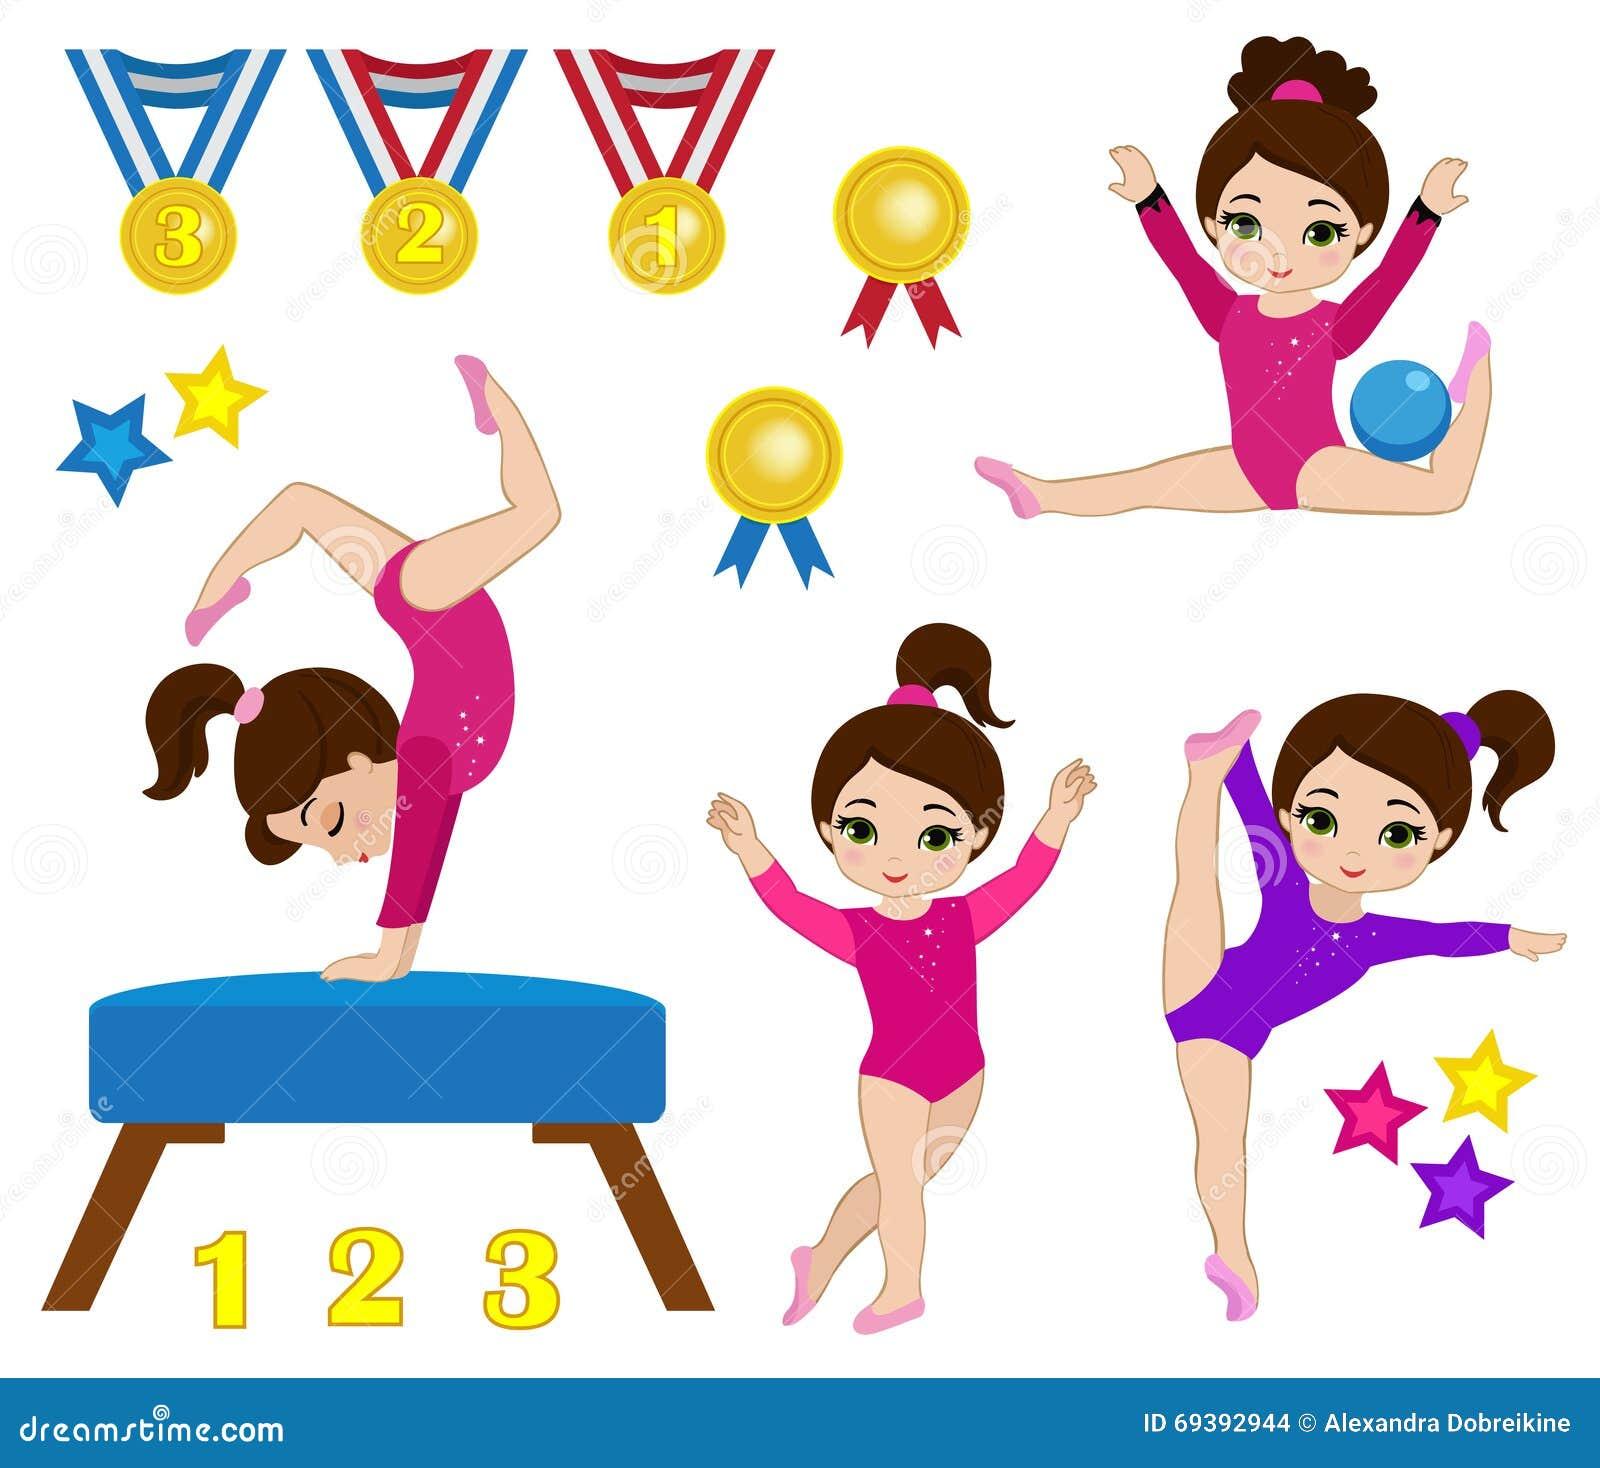 clip art gymnastics poses - photo #37